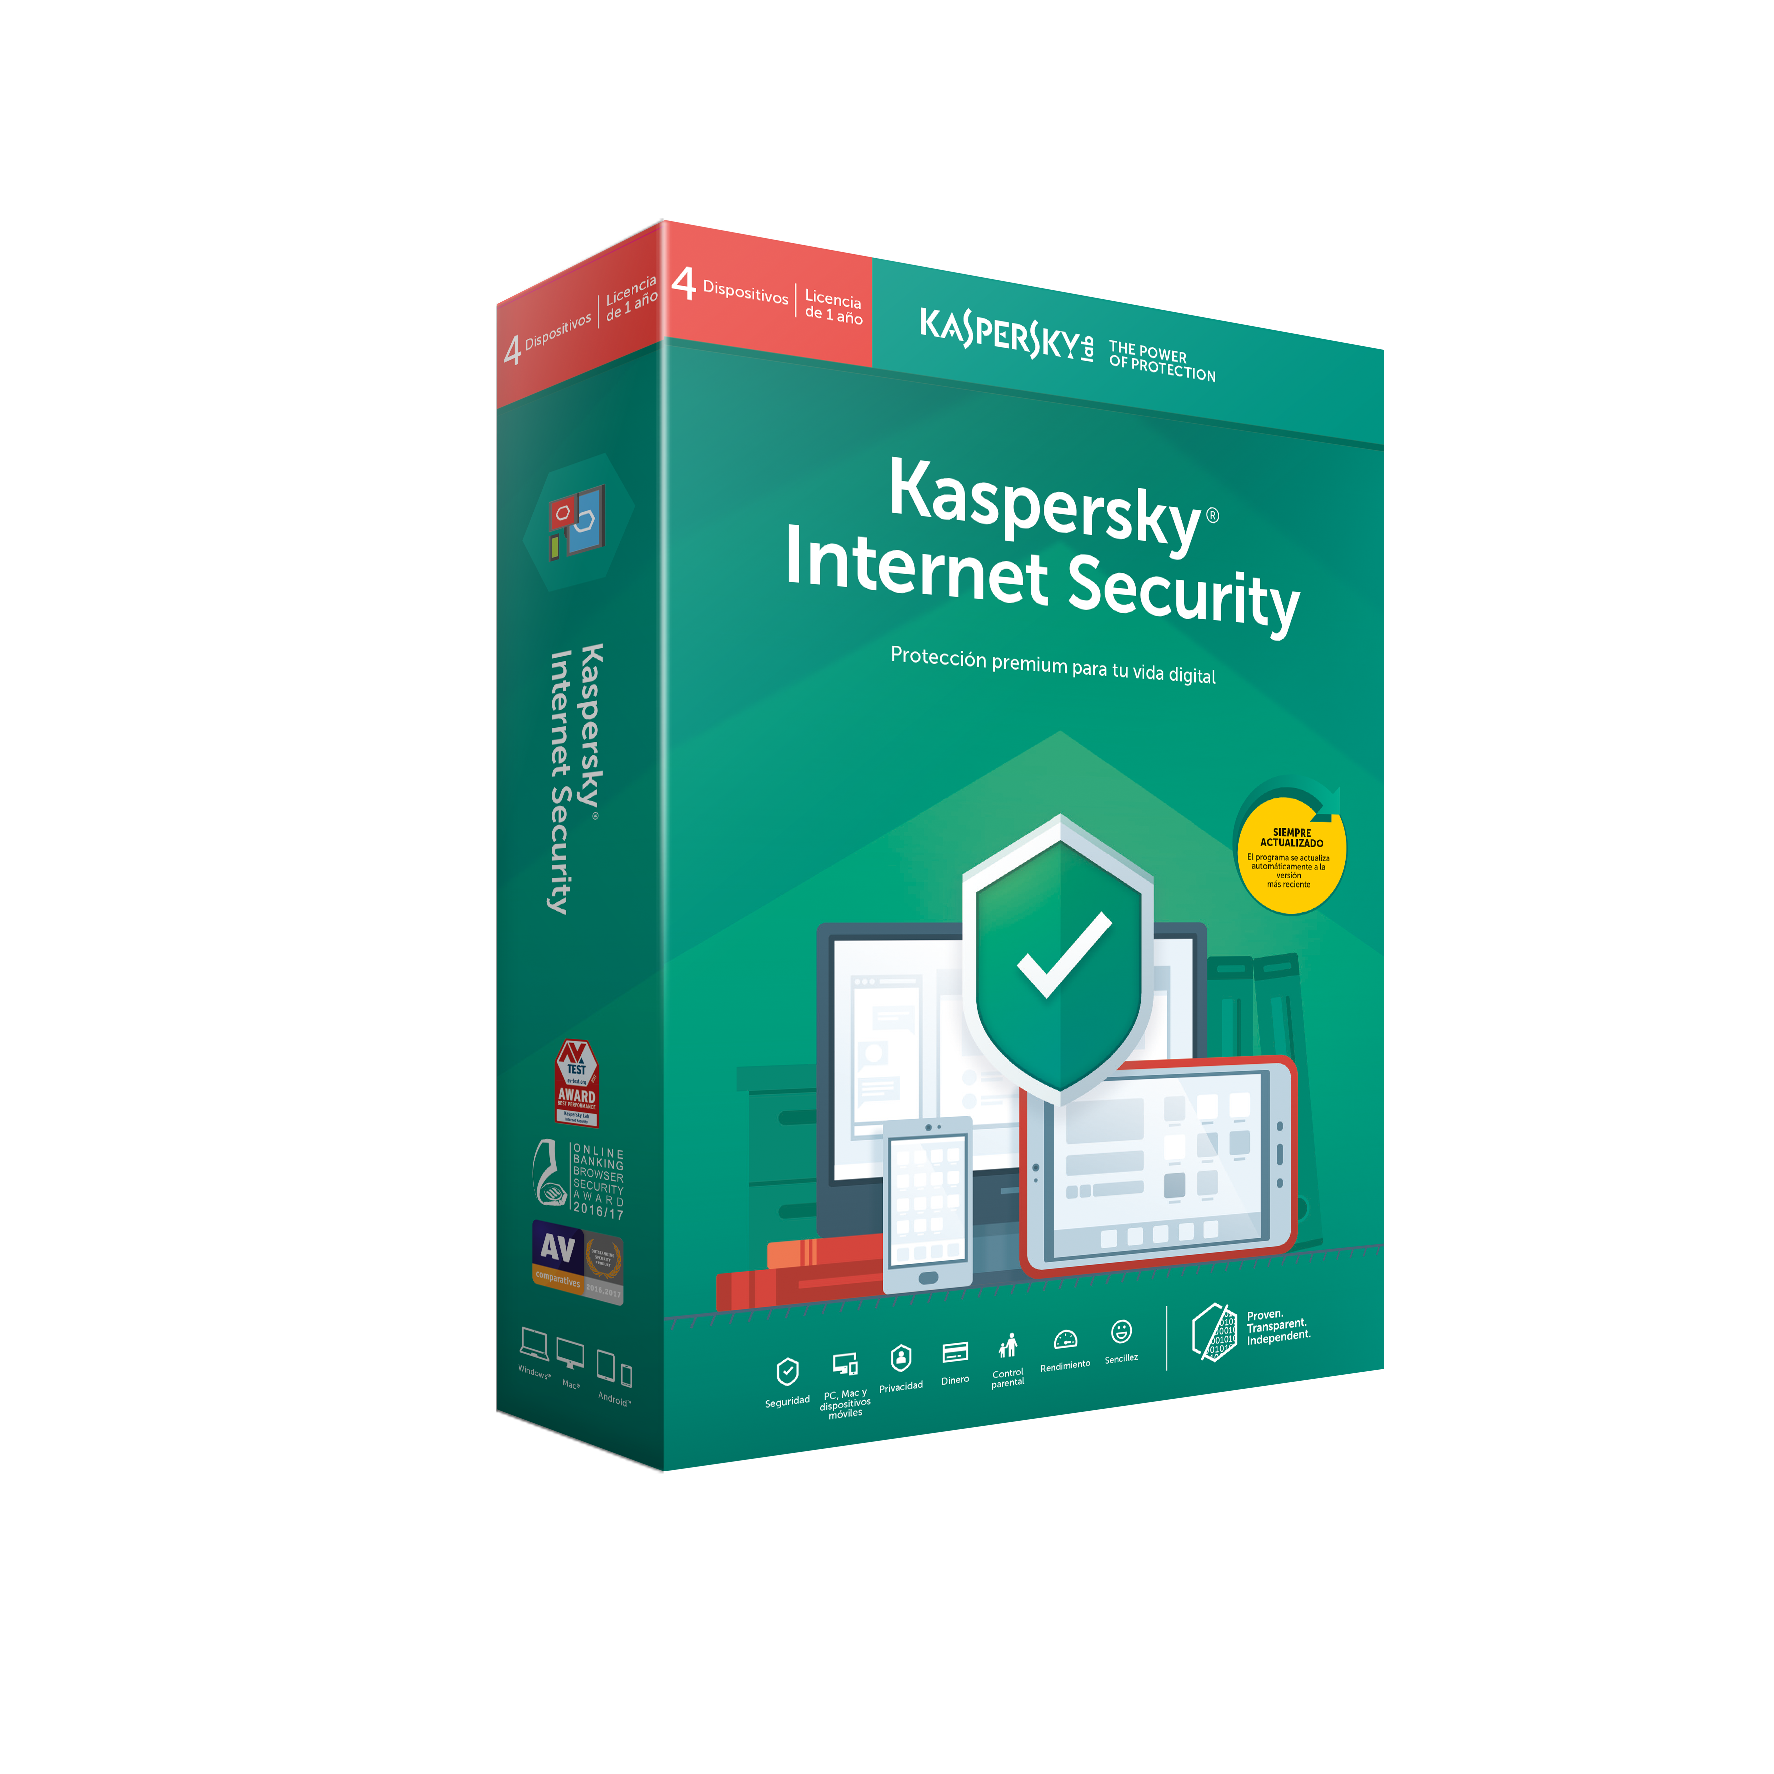 ANTIVIRUS KASPERSKY 2019 4 US INT SECURITY